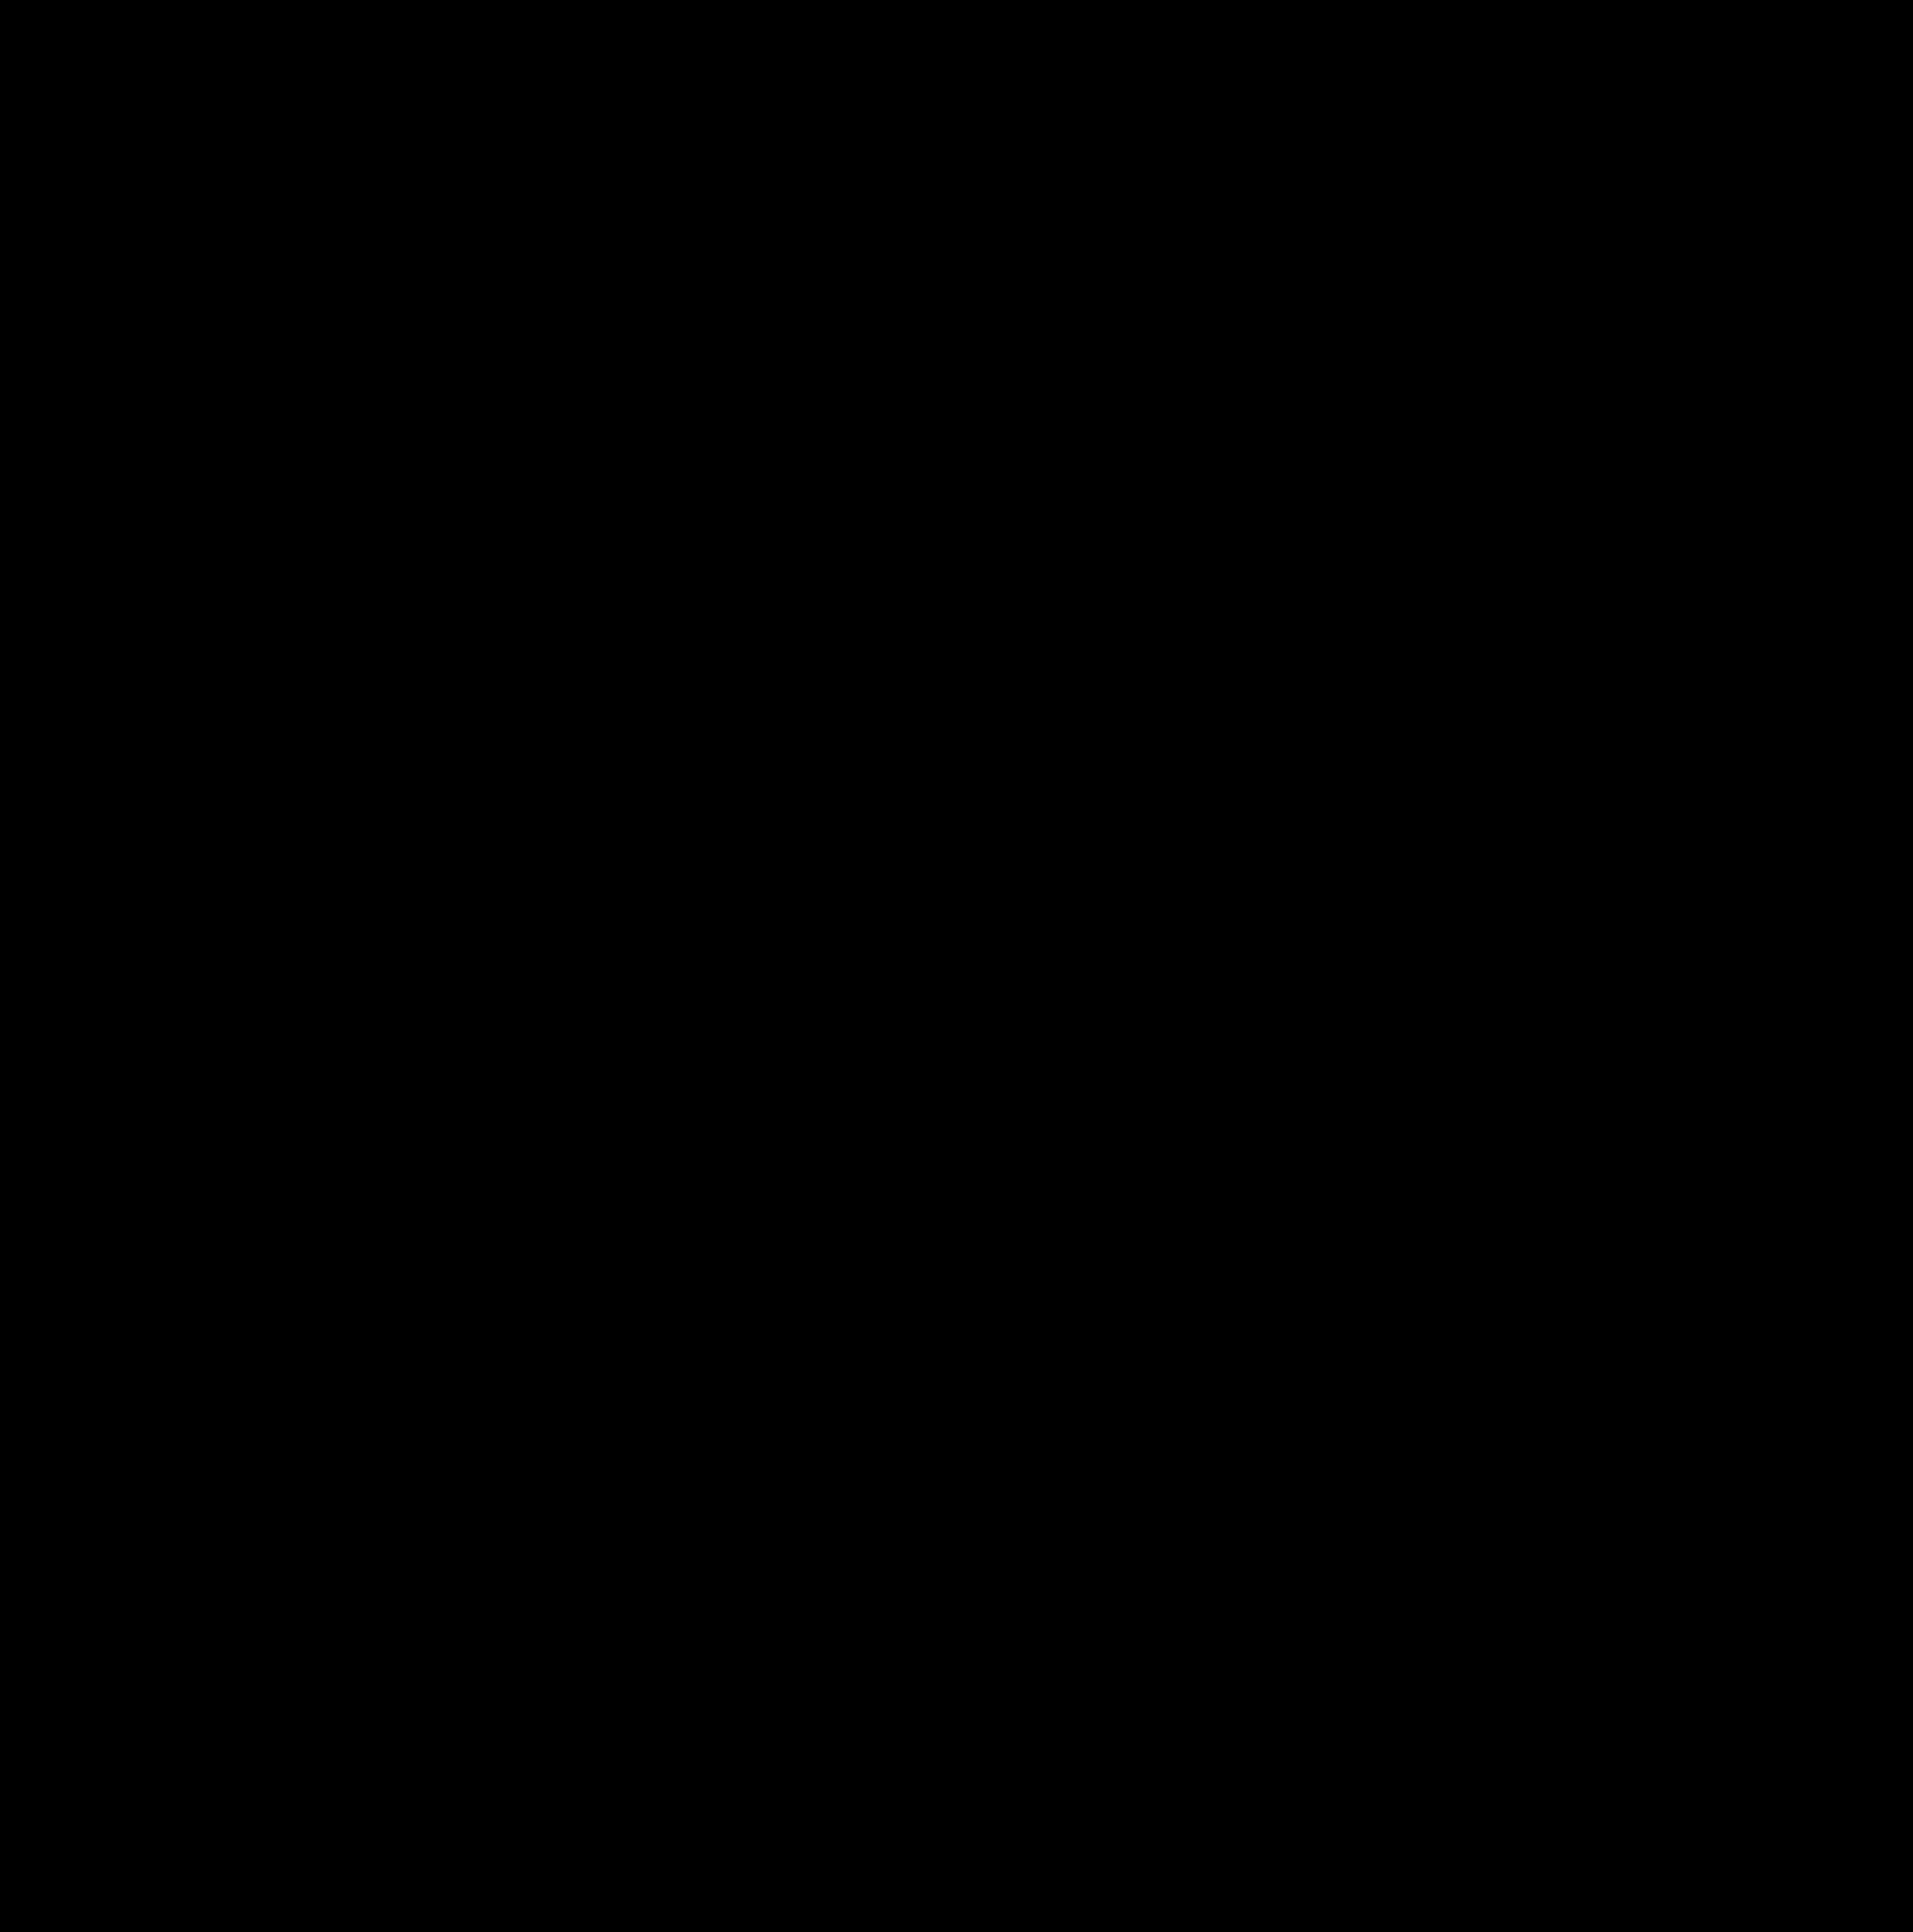 Greek clipart silhouette. Male archer big image